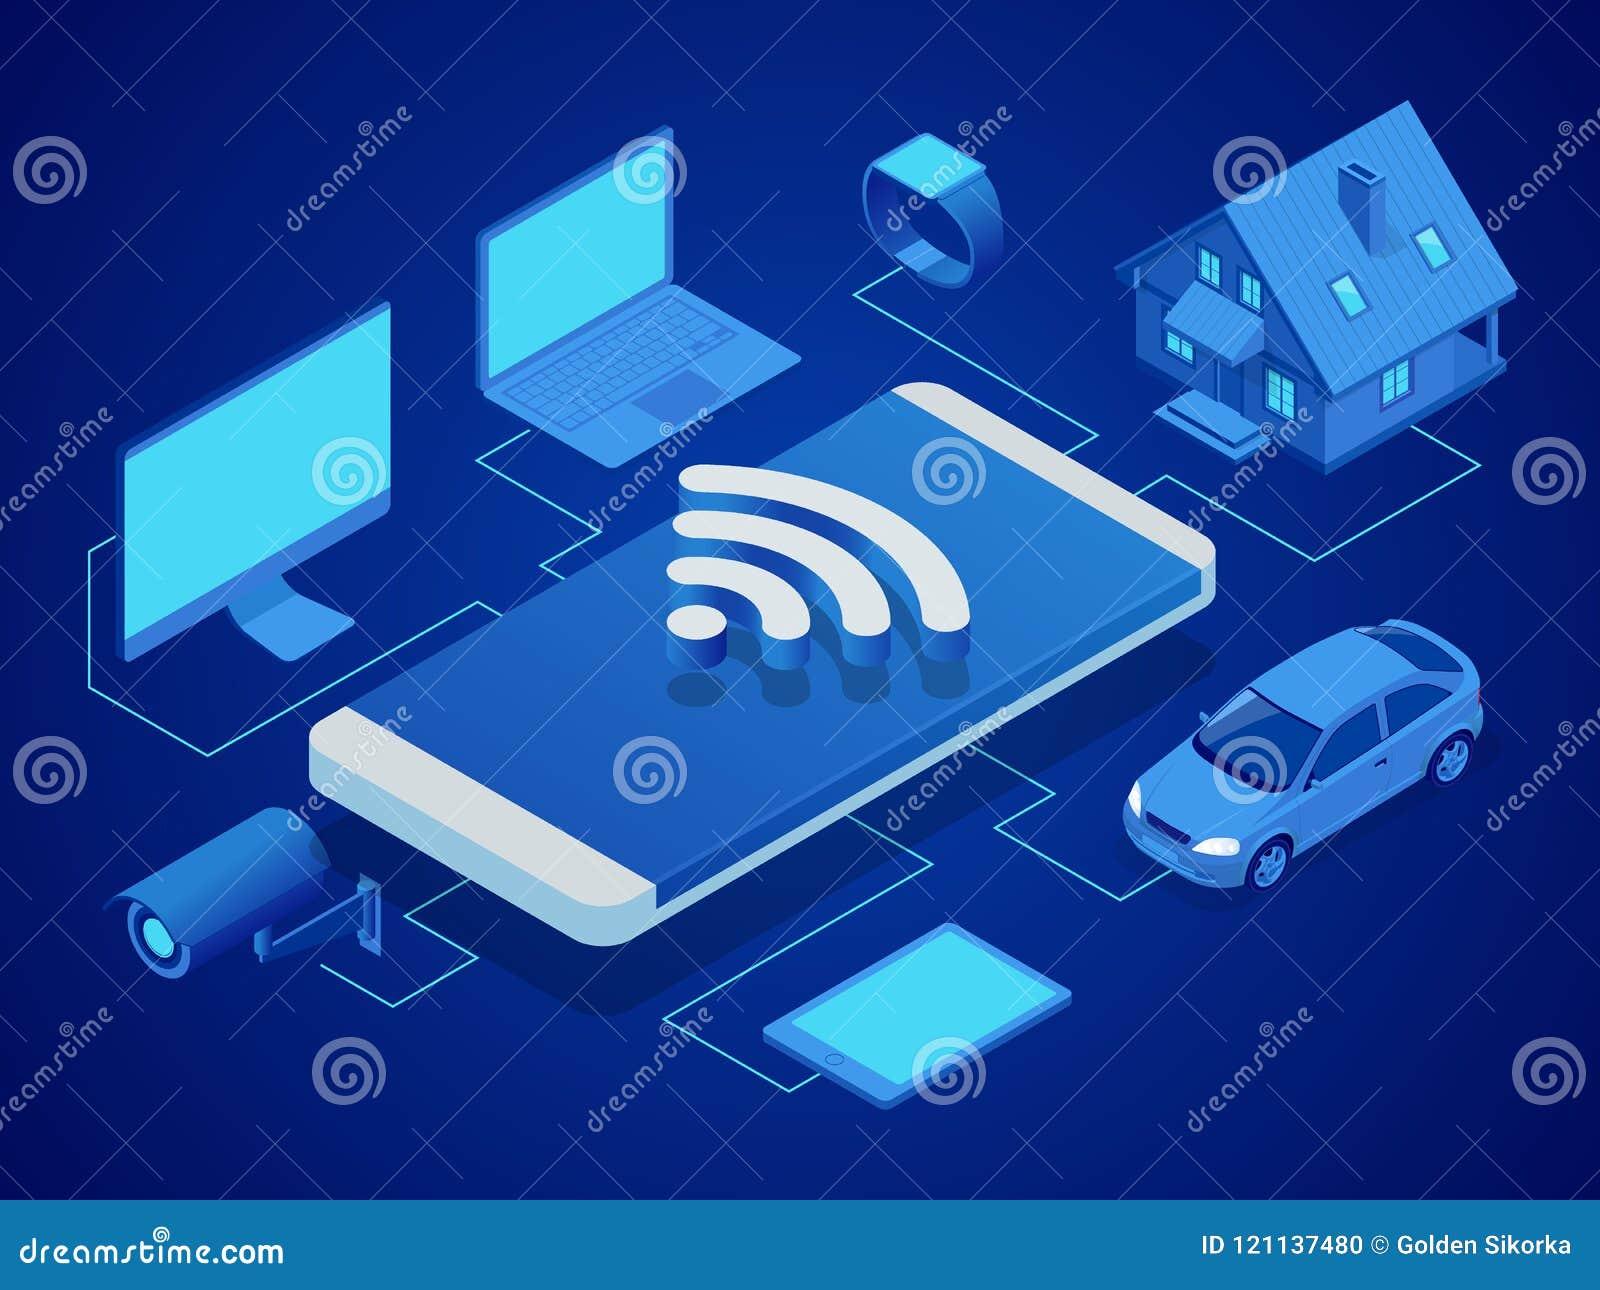 Isometrisk smart teknologi som kontrollerar huset, dator, smart klocka, maskin, video bevakning, minnestavla Säkerhet